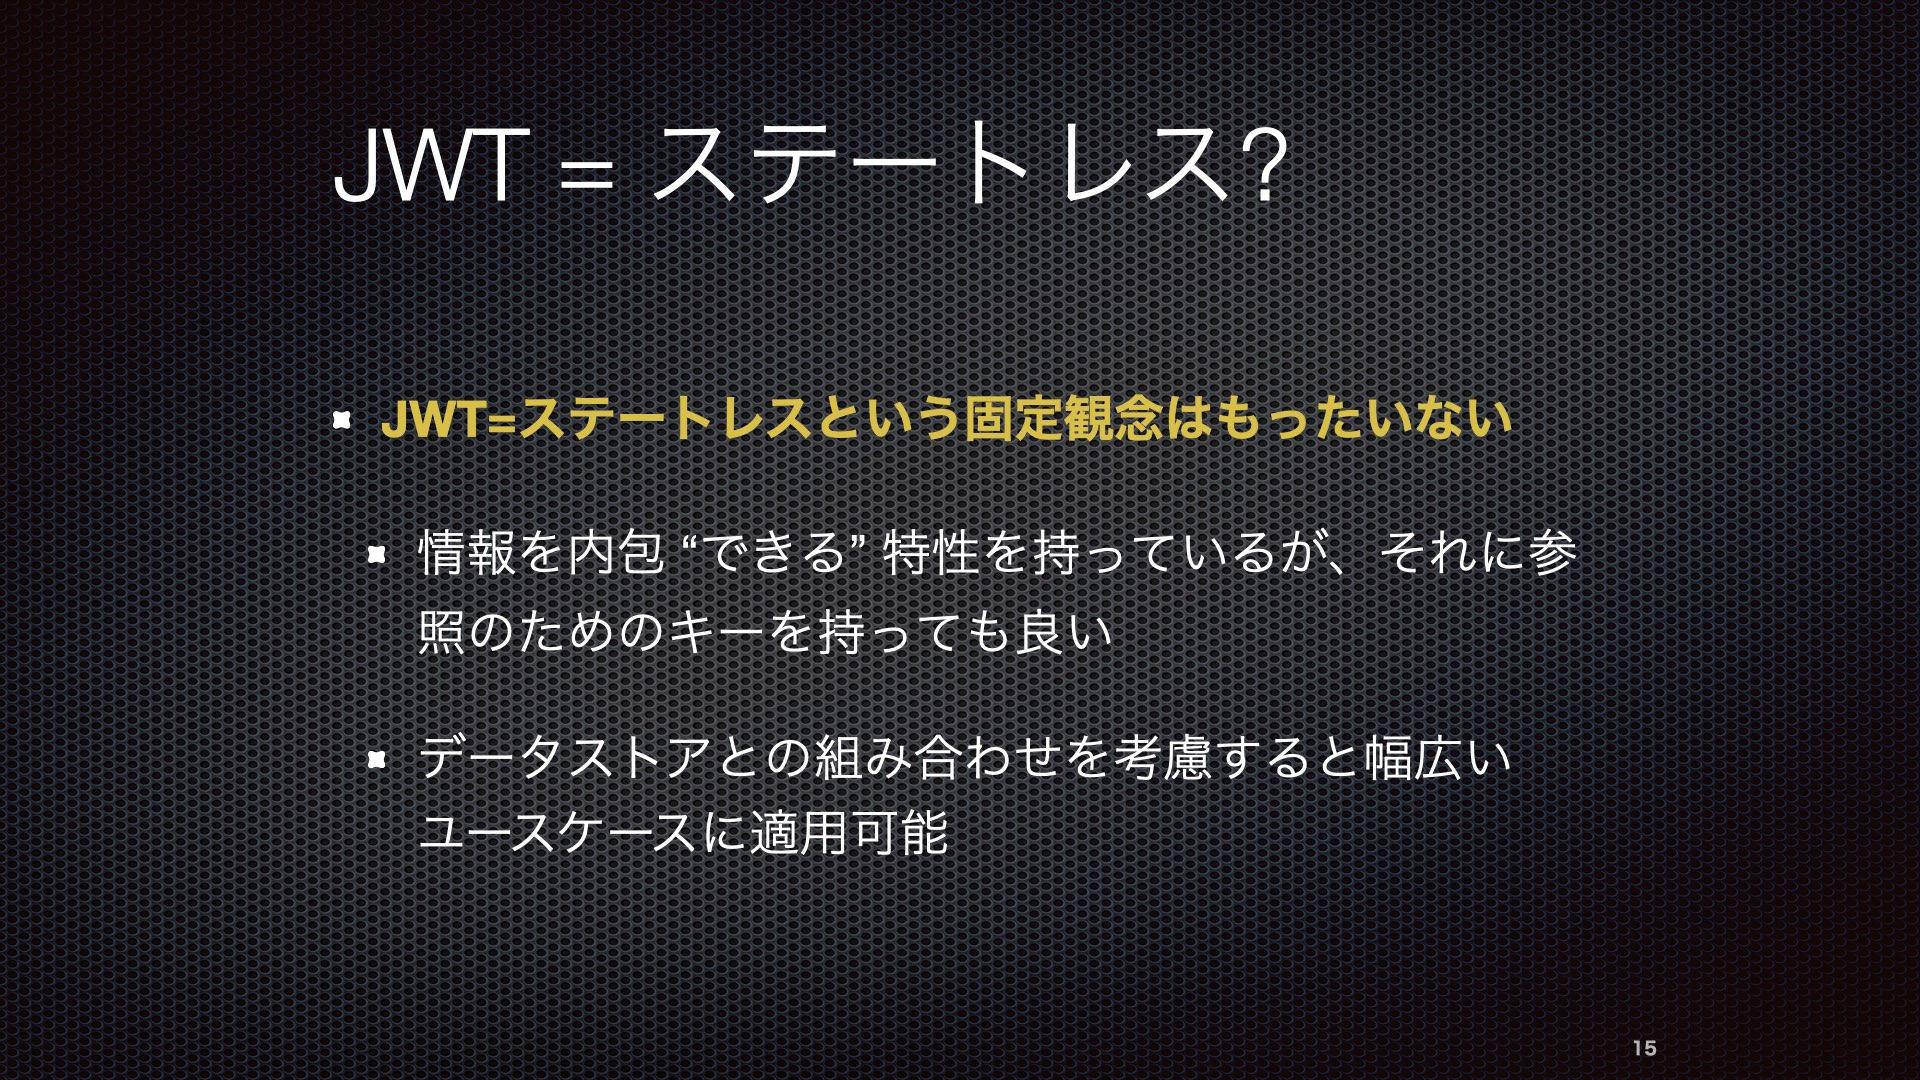 JWTBootCamp2020 015